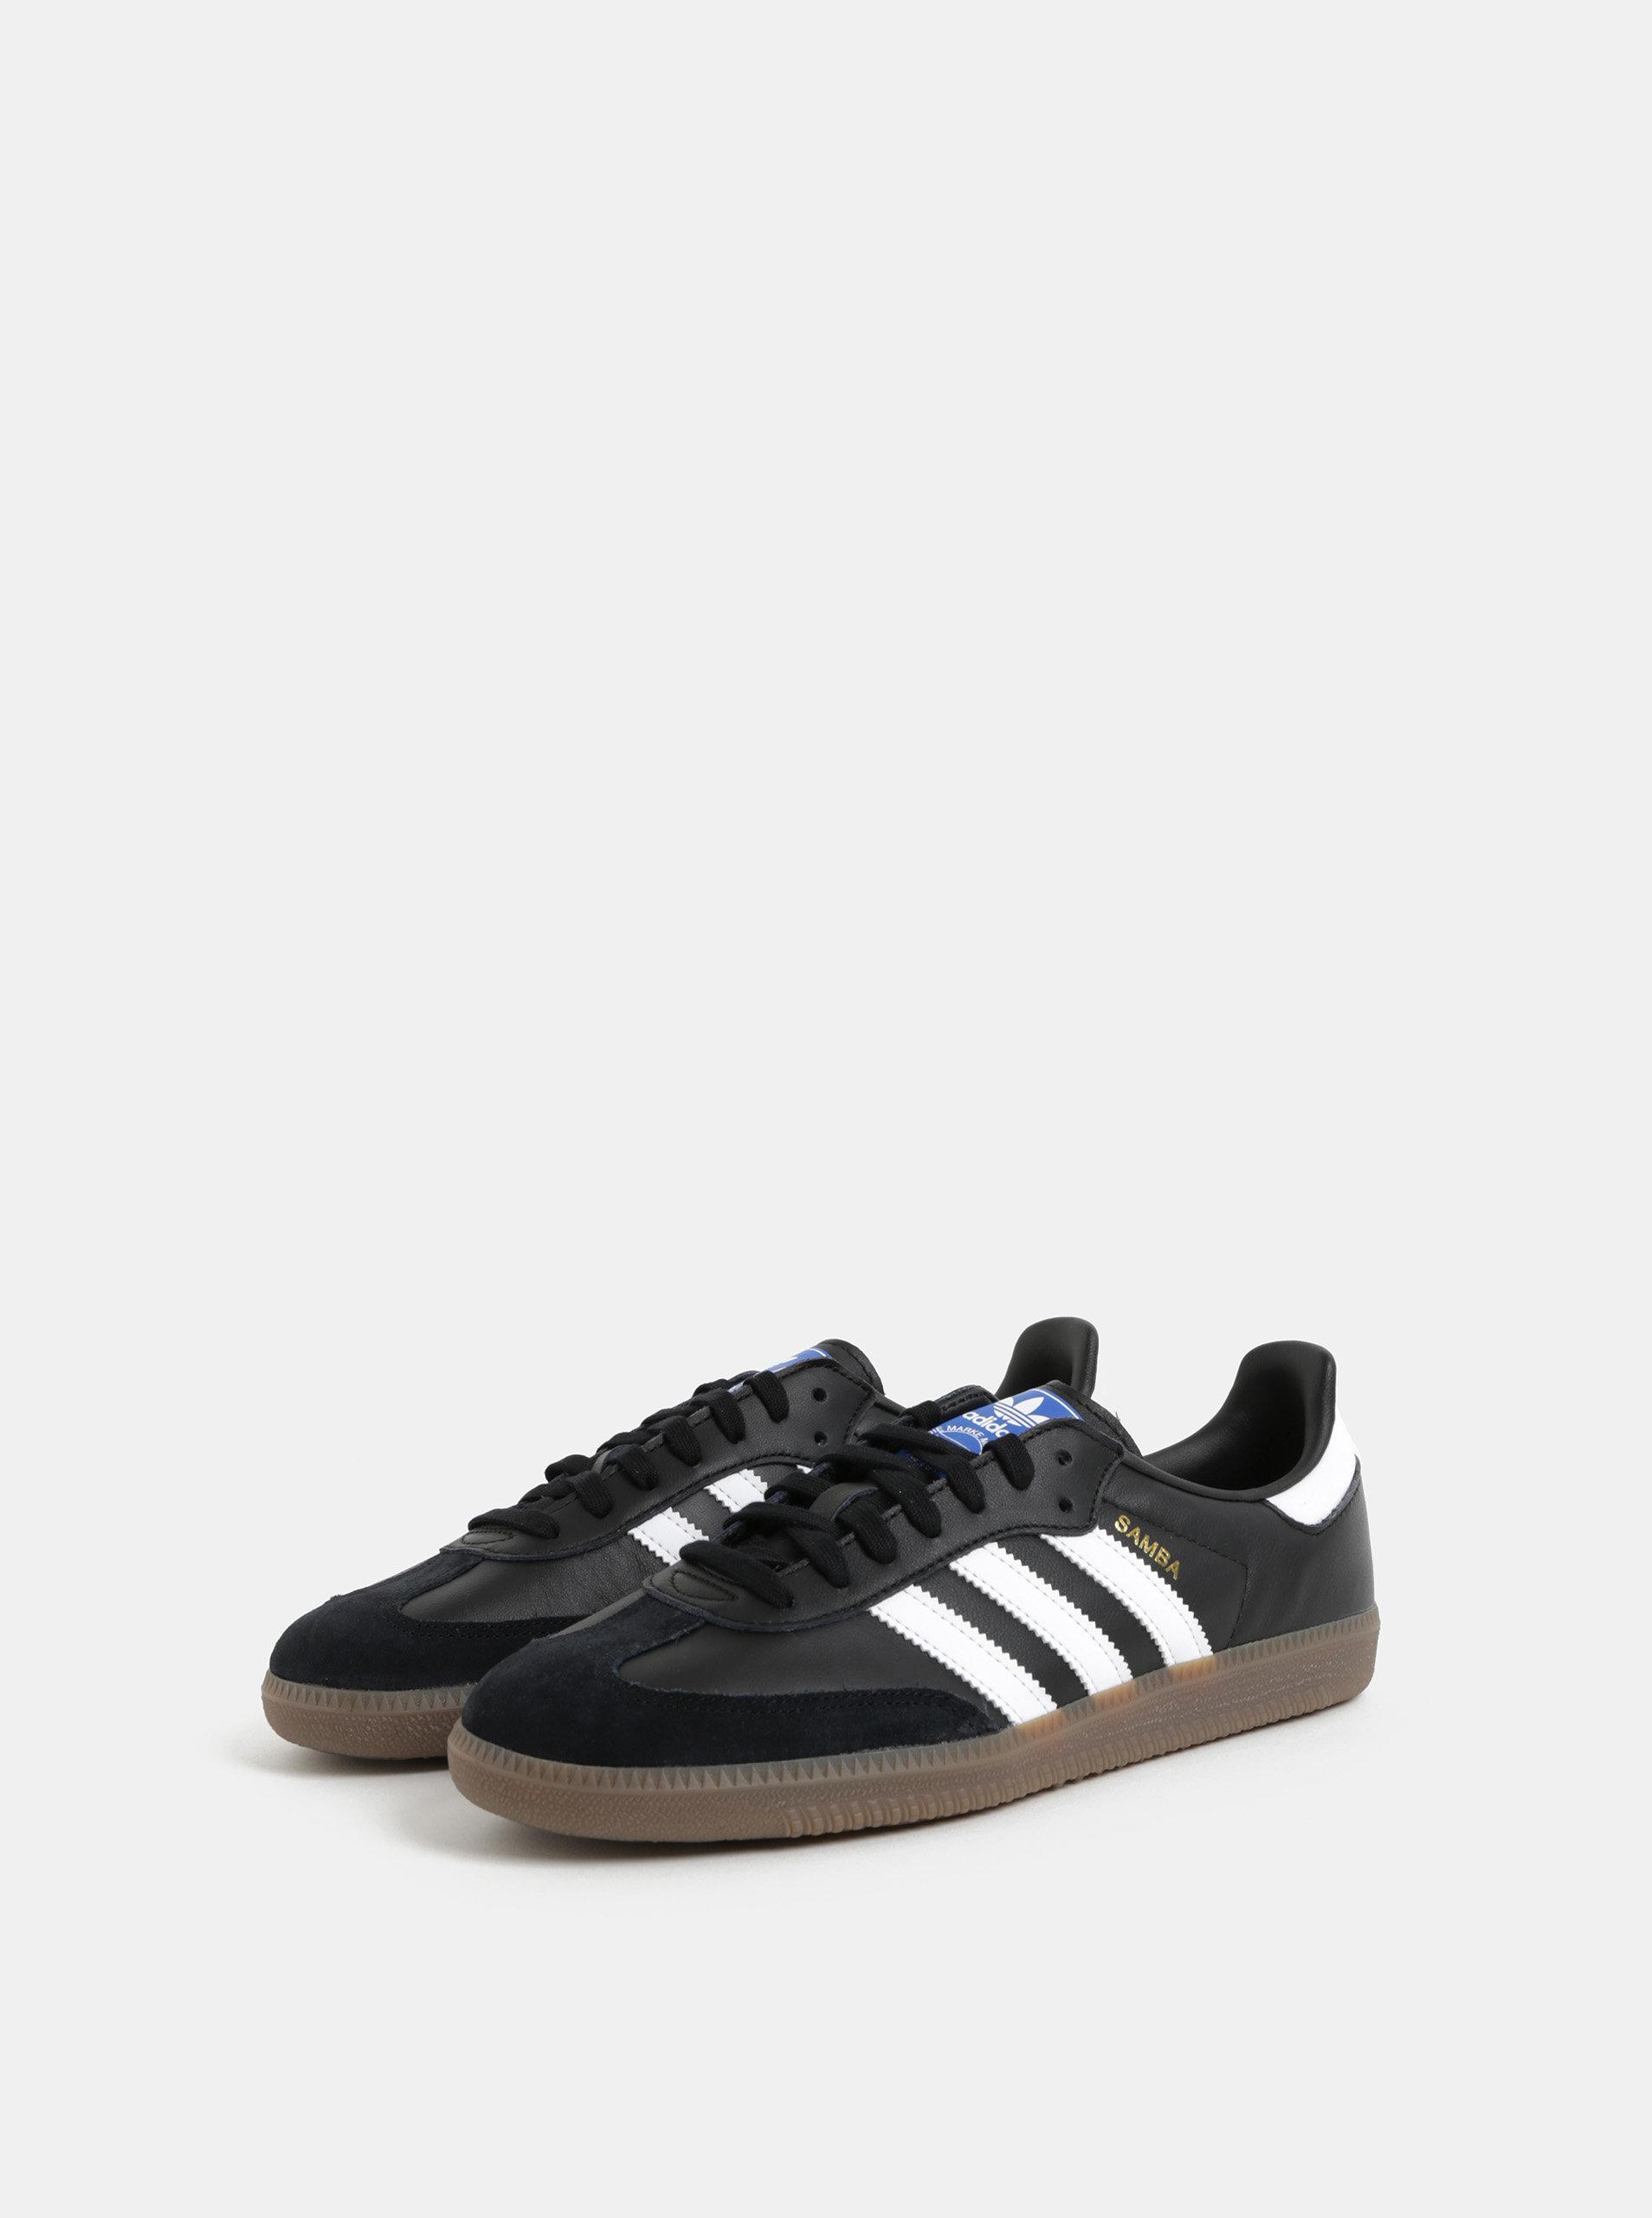 0344fad03 Černé pánské kožené tenisky adidas Originals Samba | ZOOT.cz